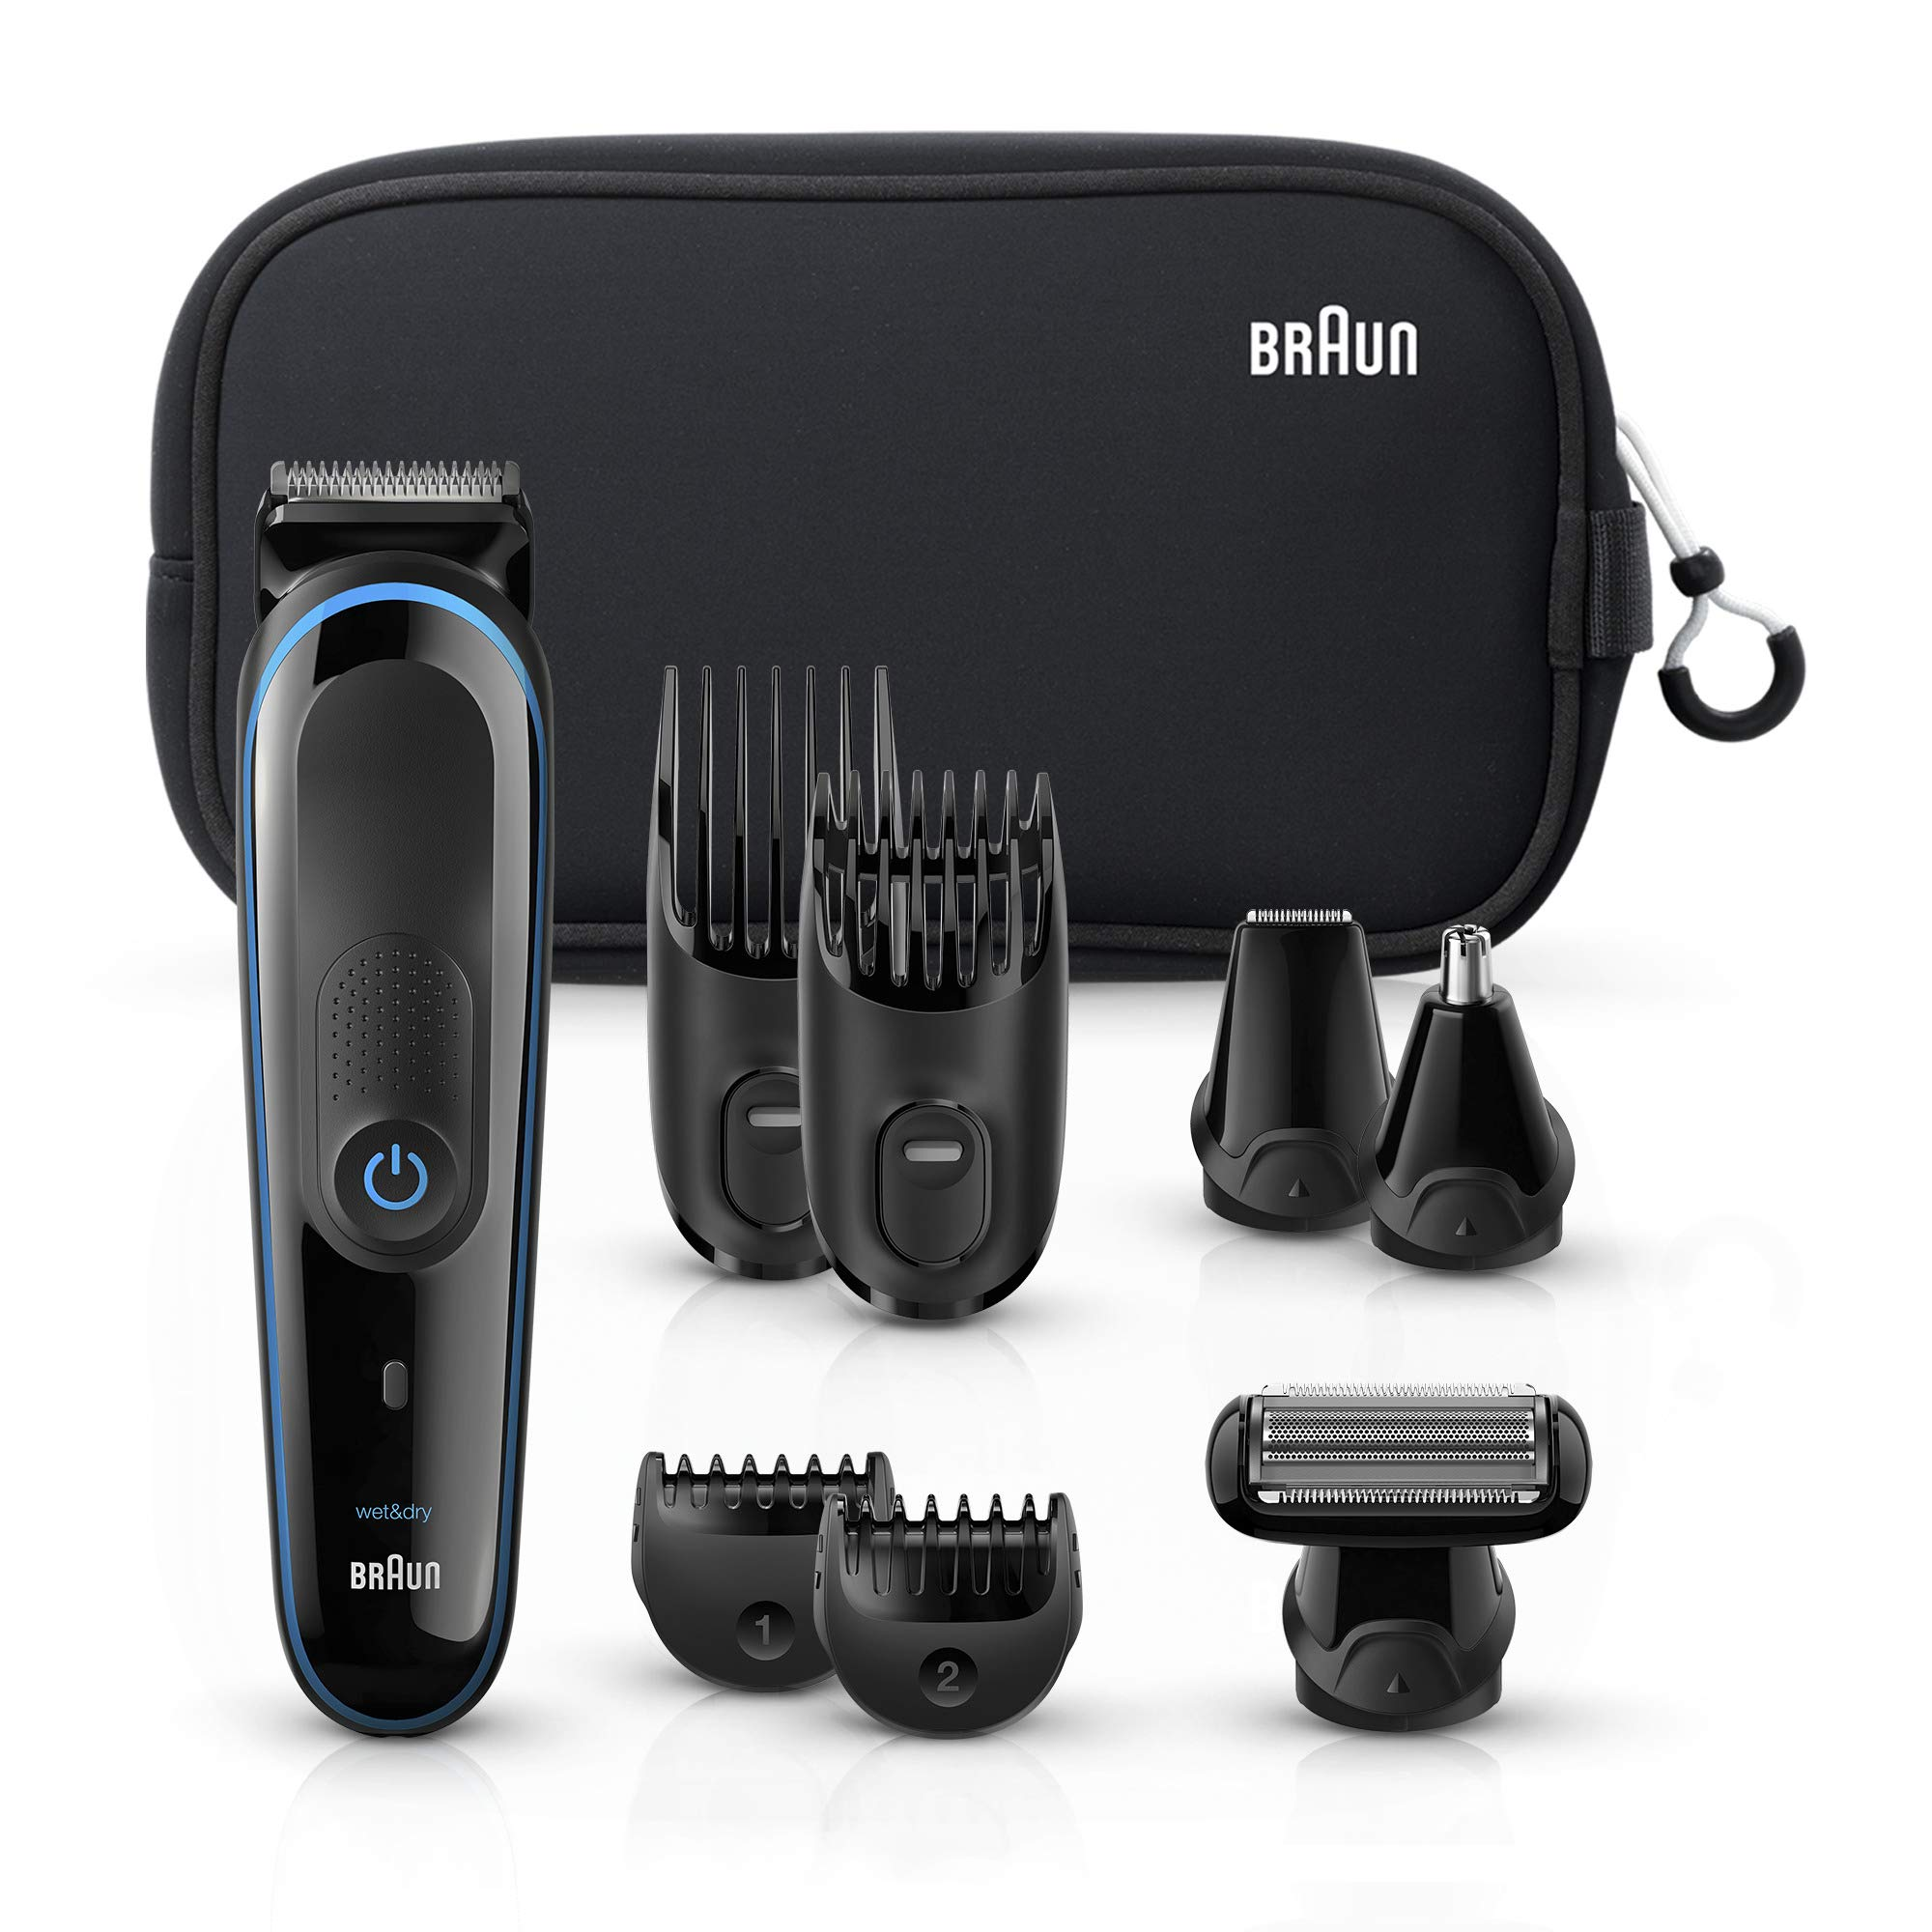 Braun Multi Grooming MGK3980 Black